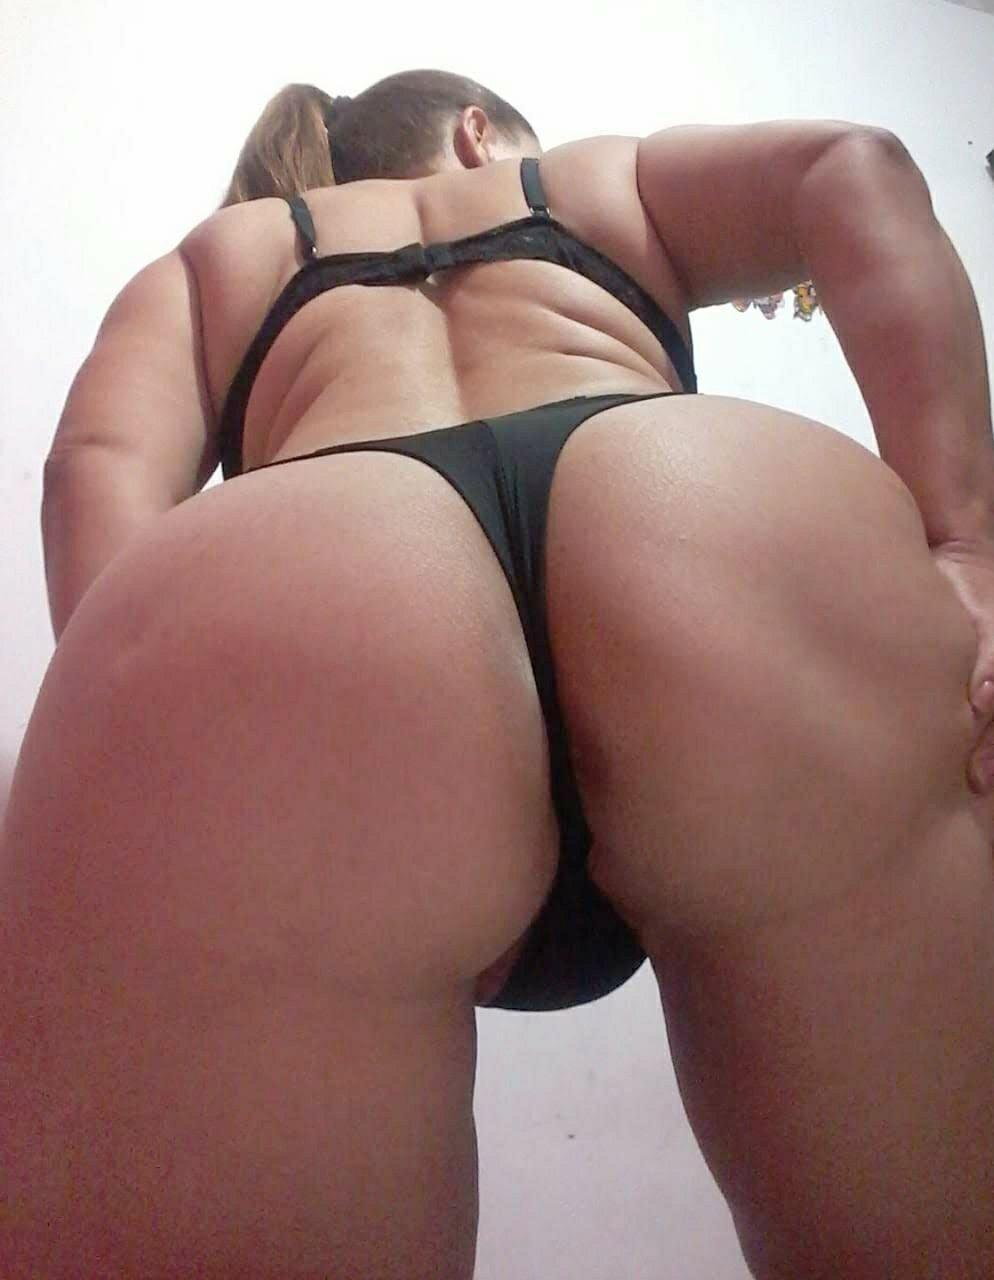 Fotos Maduras viejas para follar, imagenes porno sexo mujeres viejas